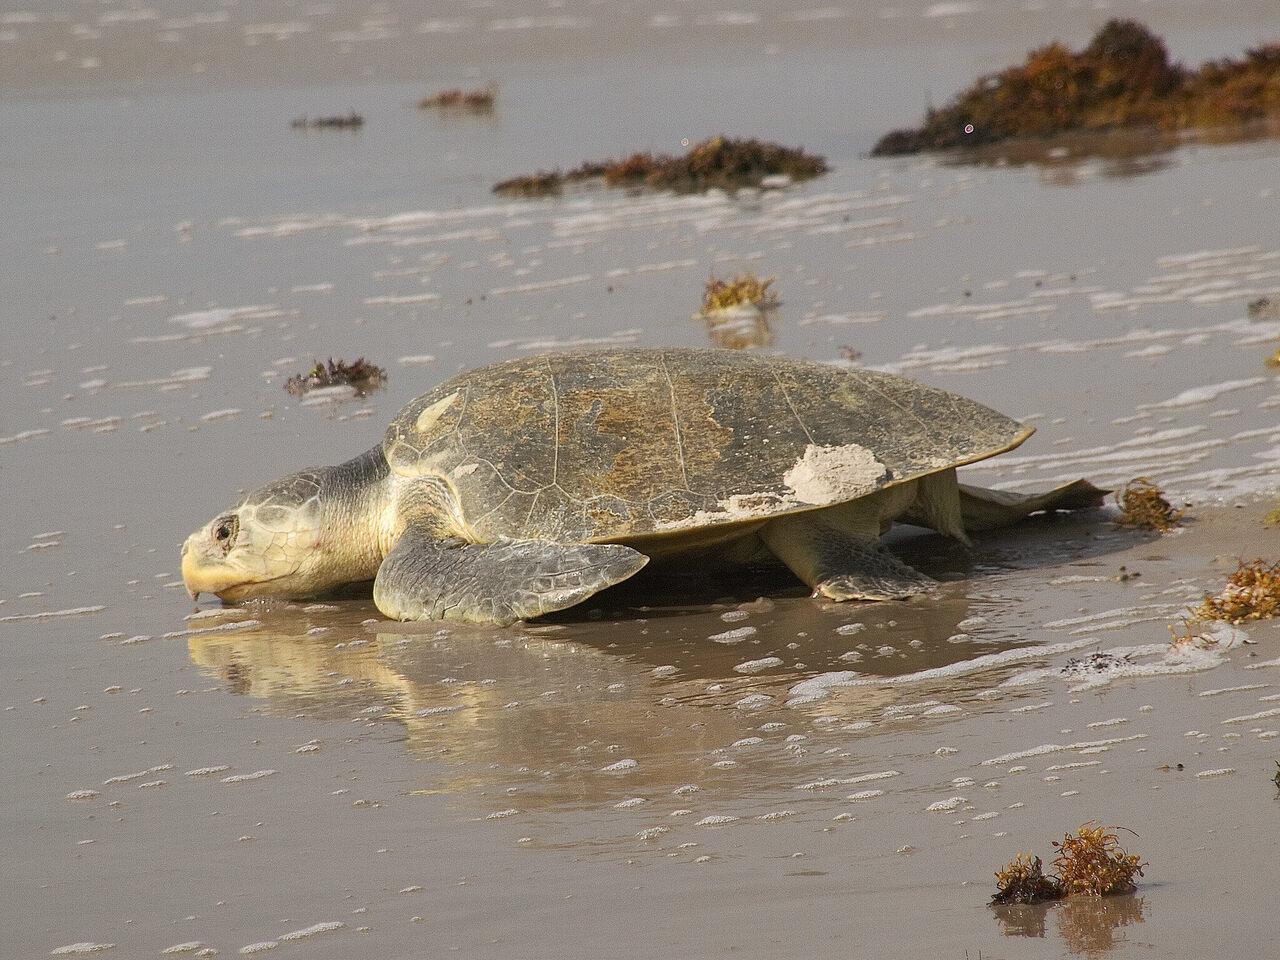 An adult Kemp's ridley sea turtle heading to sea.